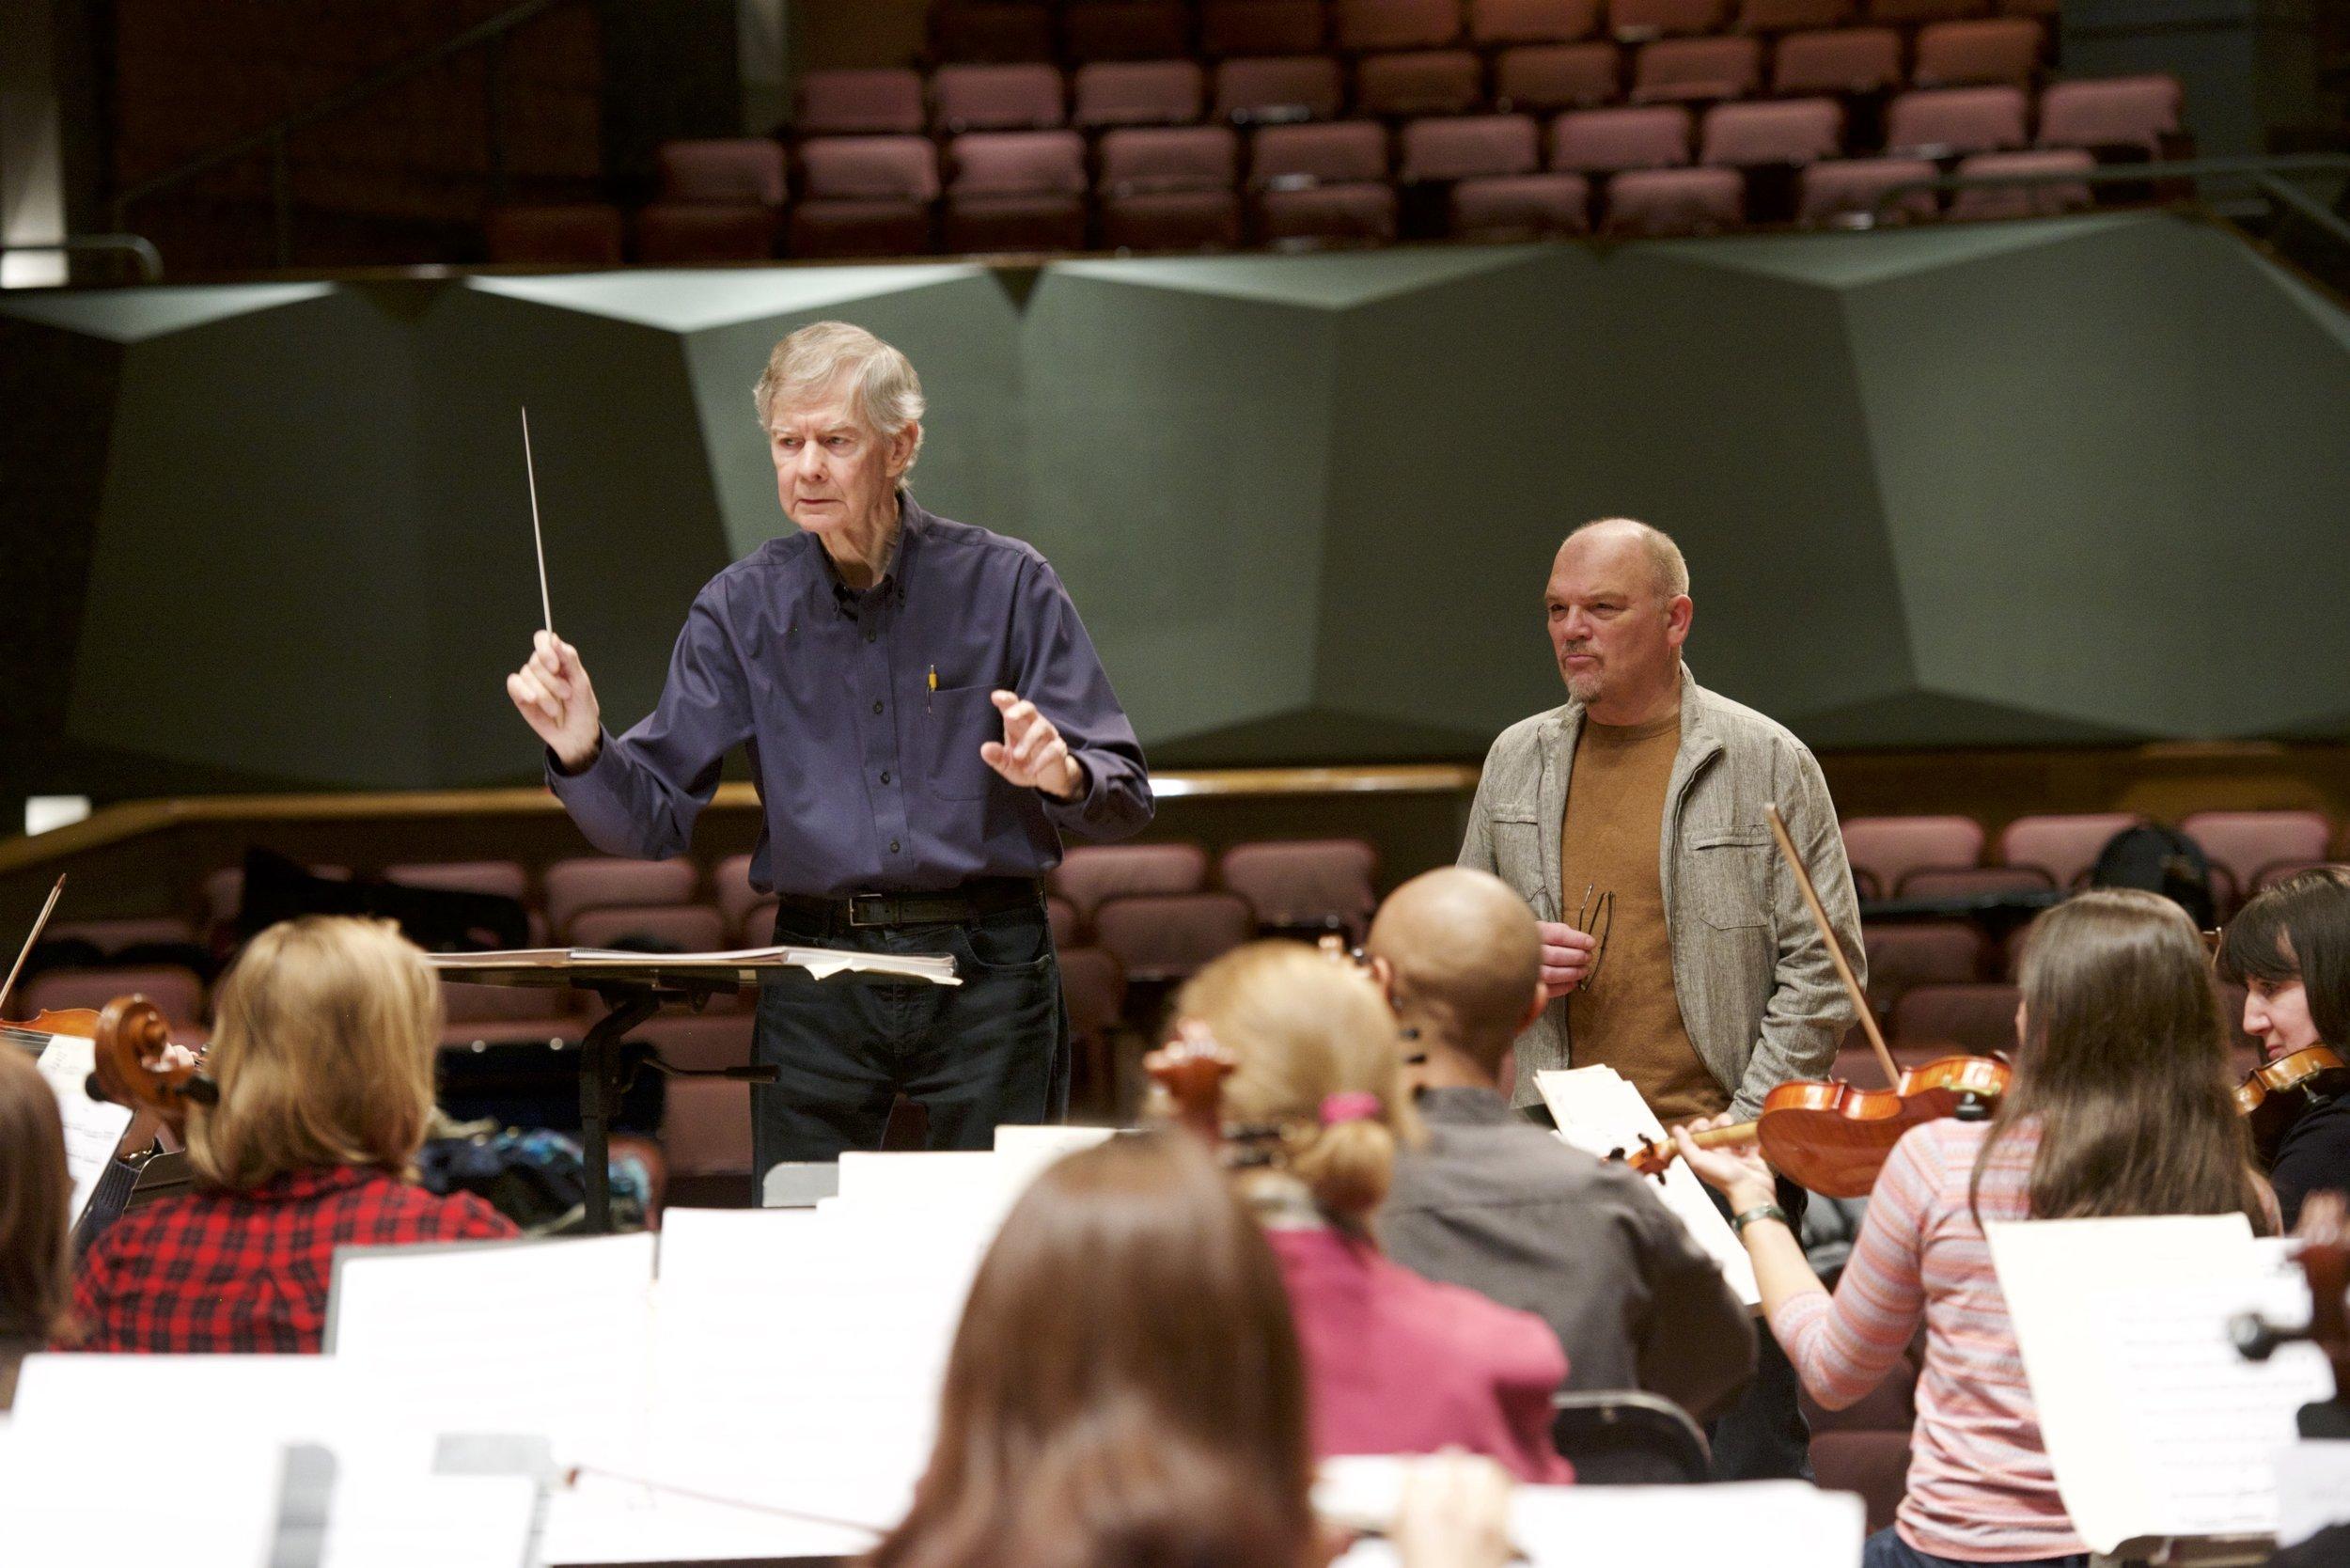 New_England_Philharmonic__2016-10-29_10-30-20_.jpg